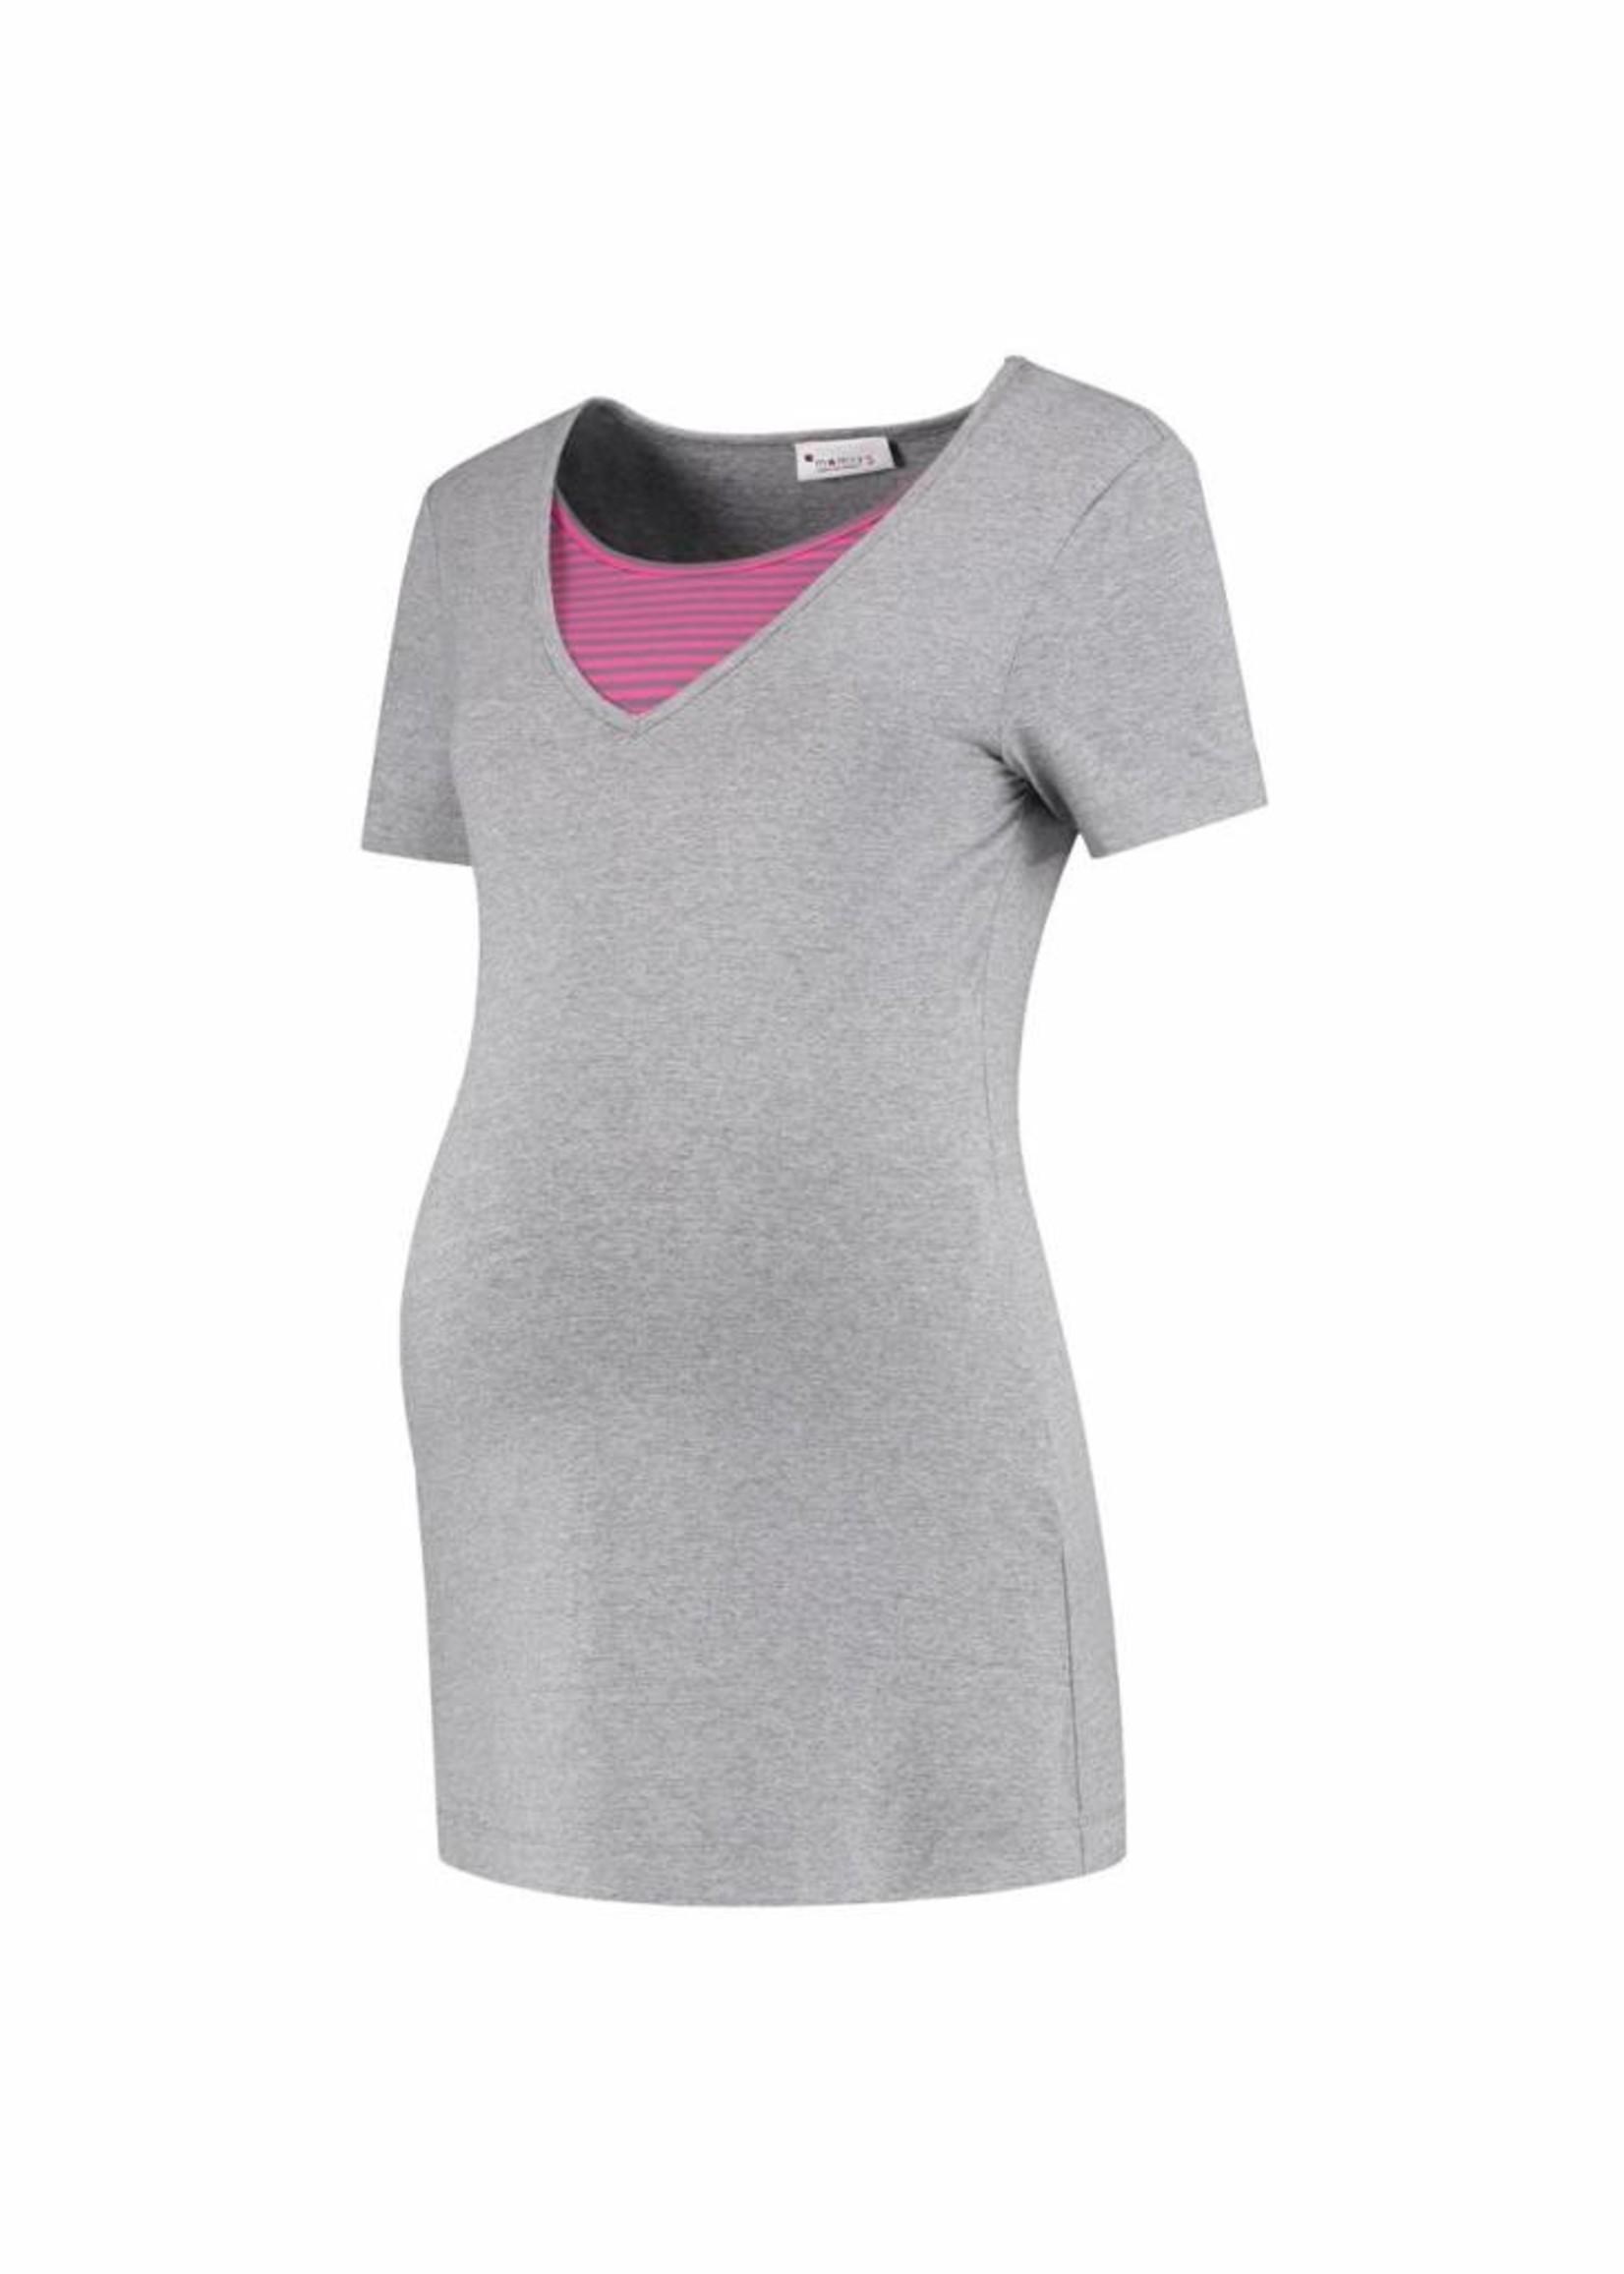 MAMSY Home Wear Shirt Grey